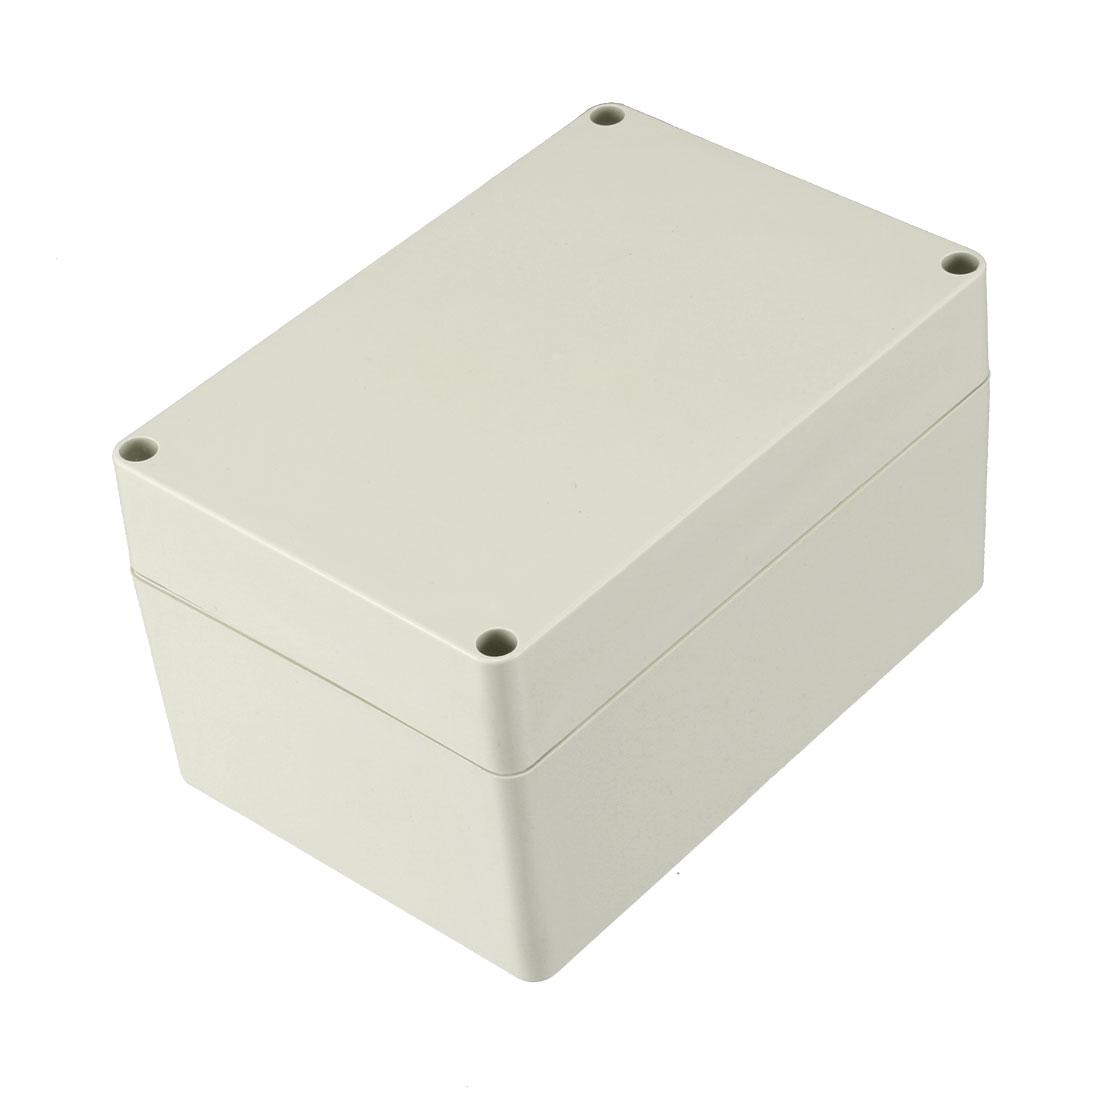 160 x 110 x 90mm Electronic ABS Plastic DIY Junction Box Enclosure Case Beige